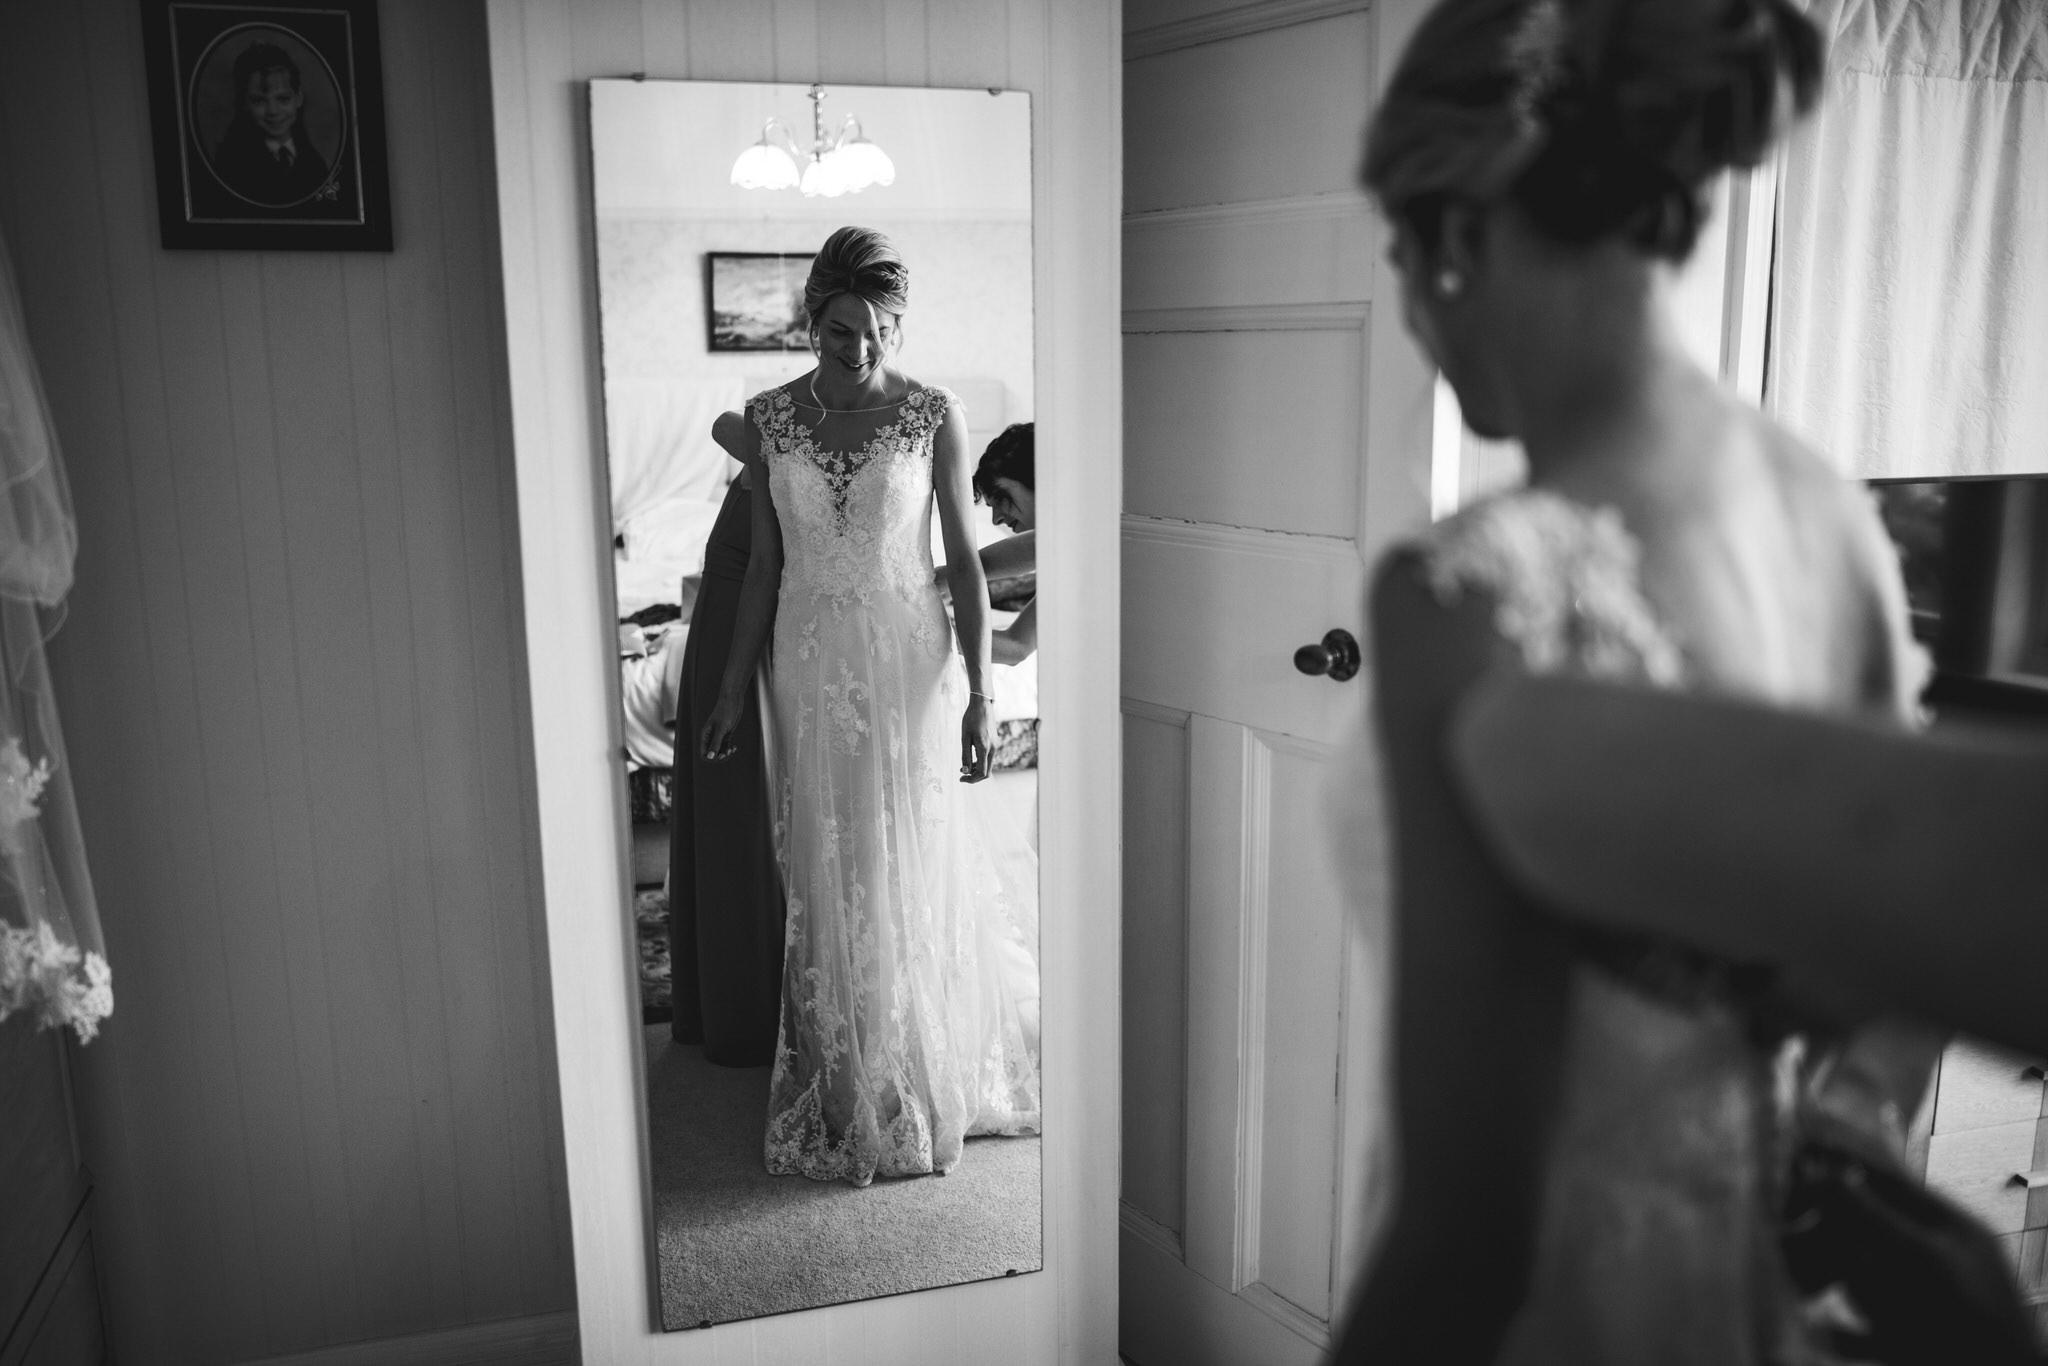 Bridal wedding photography